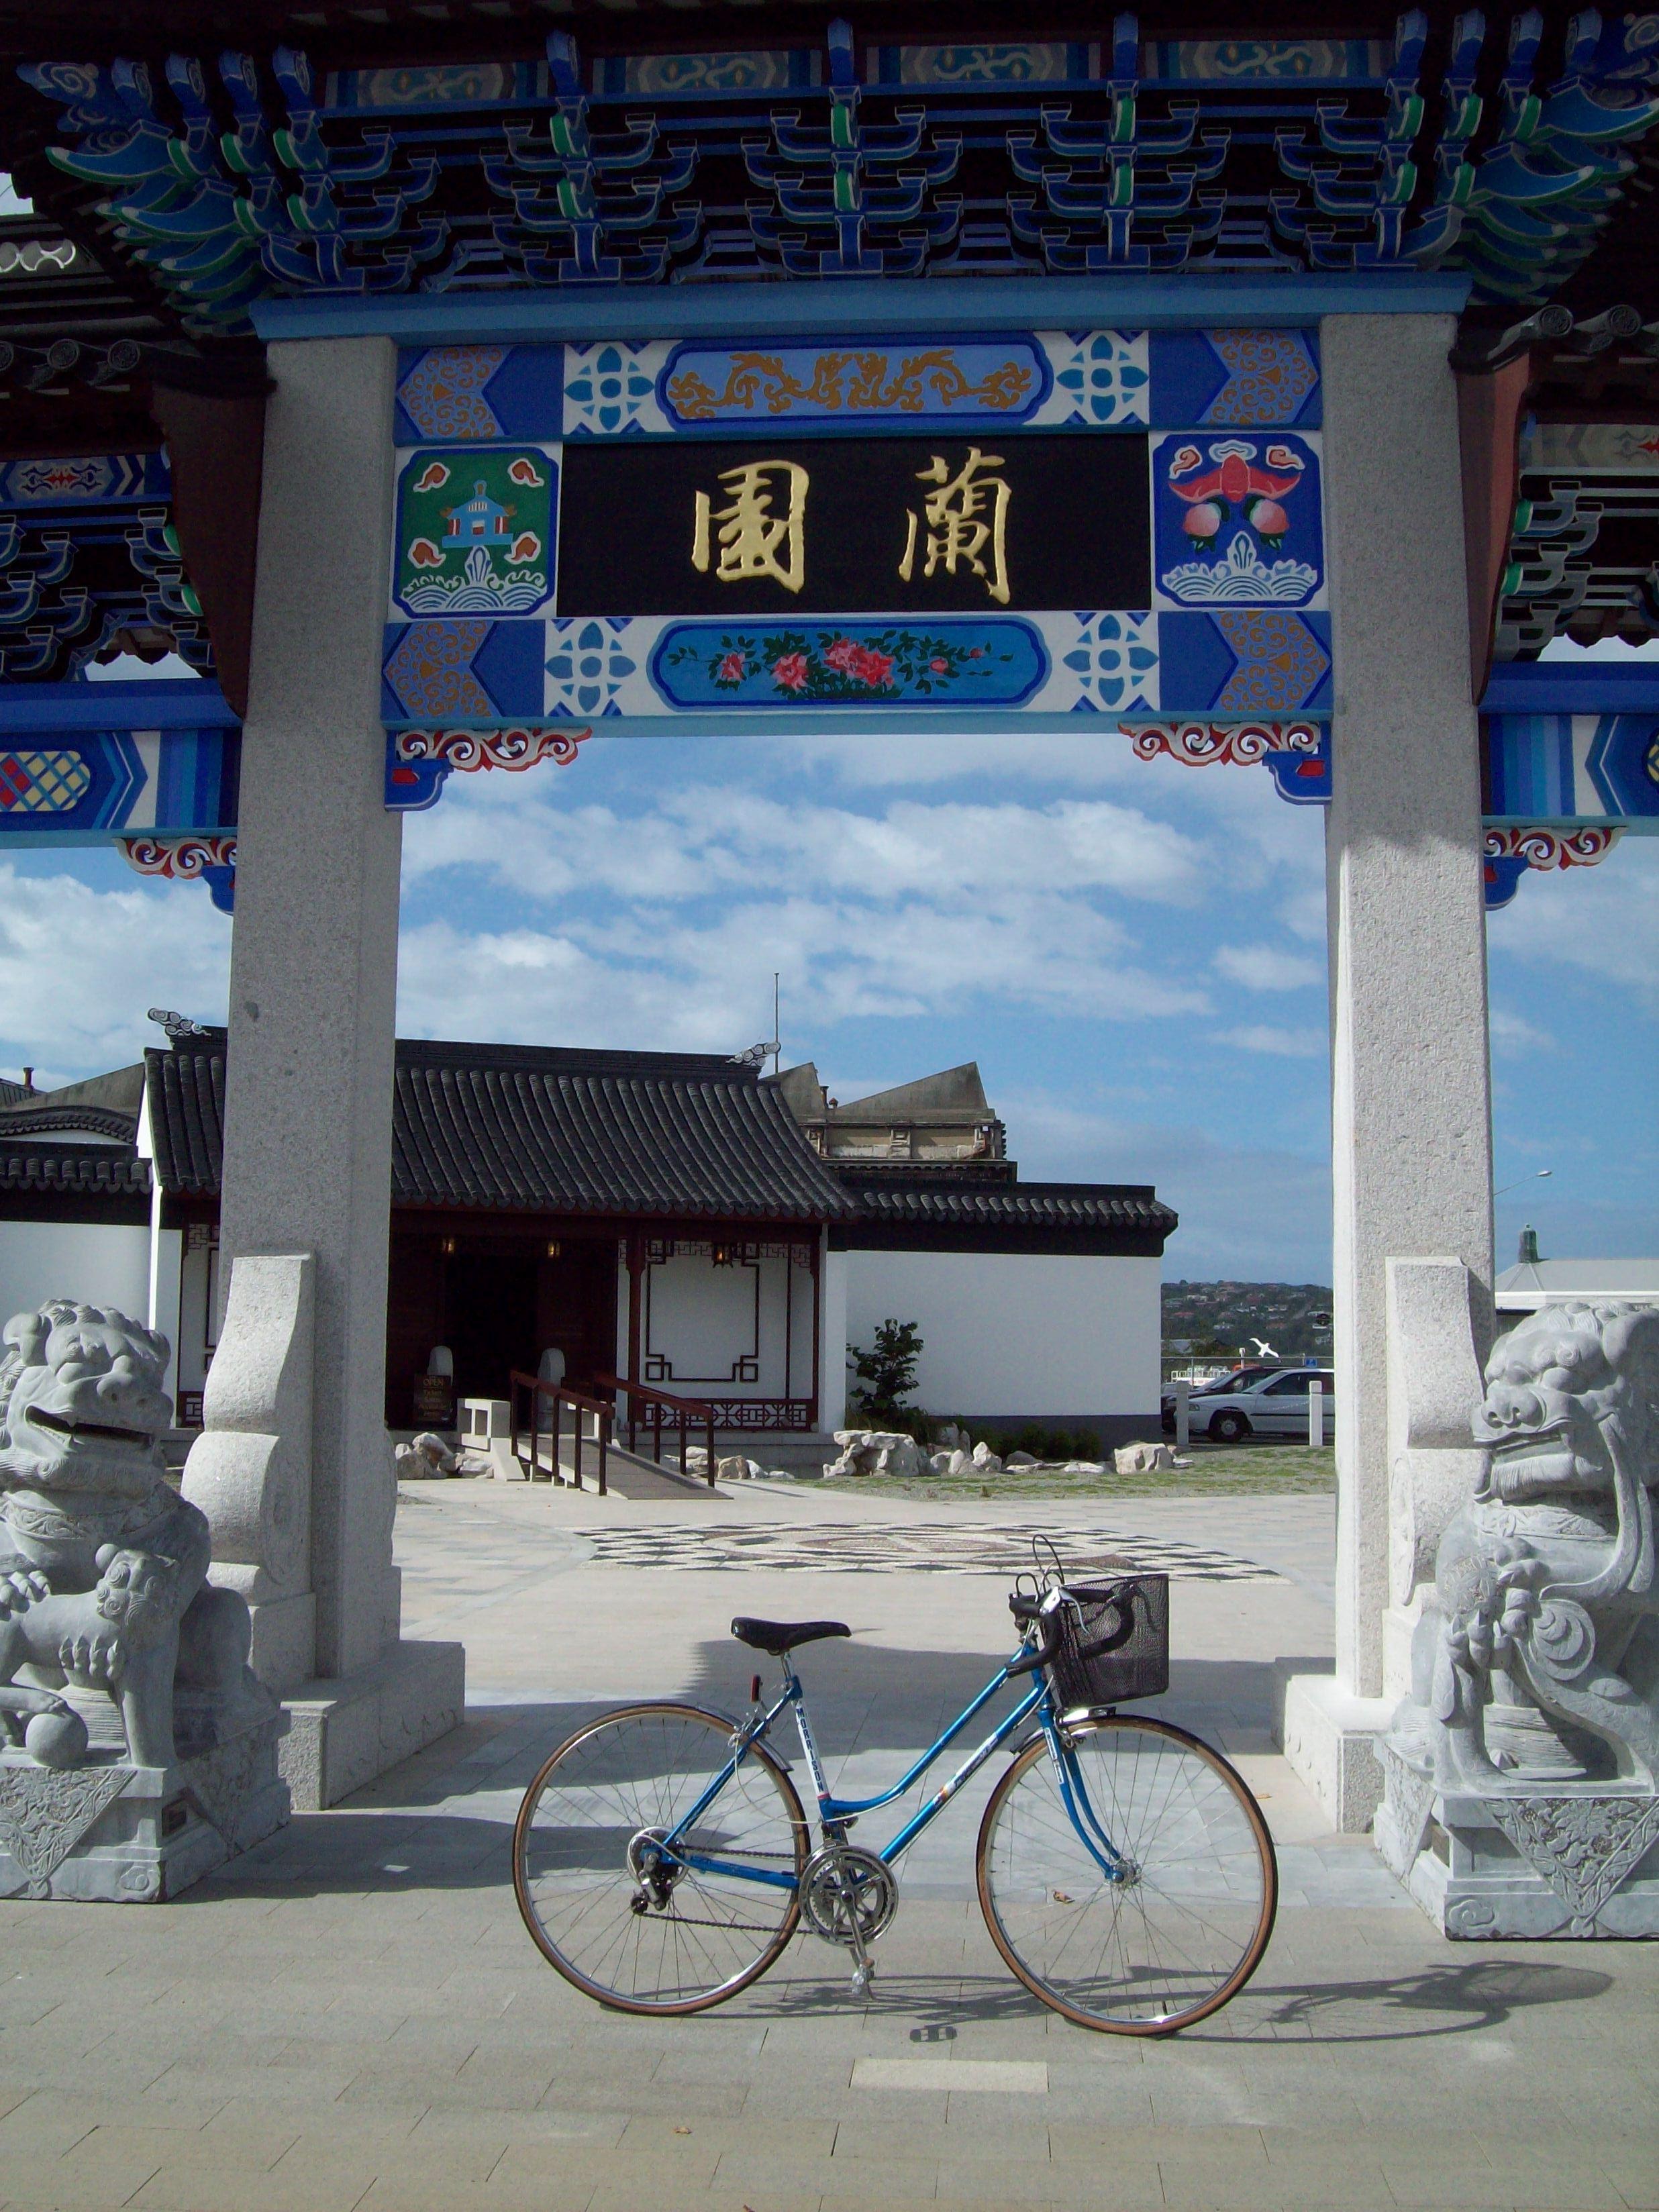 Morrison Freeway Ten Speed - blue ladies, Bicycle, Used, Tyre, Transport, HQ Photo